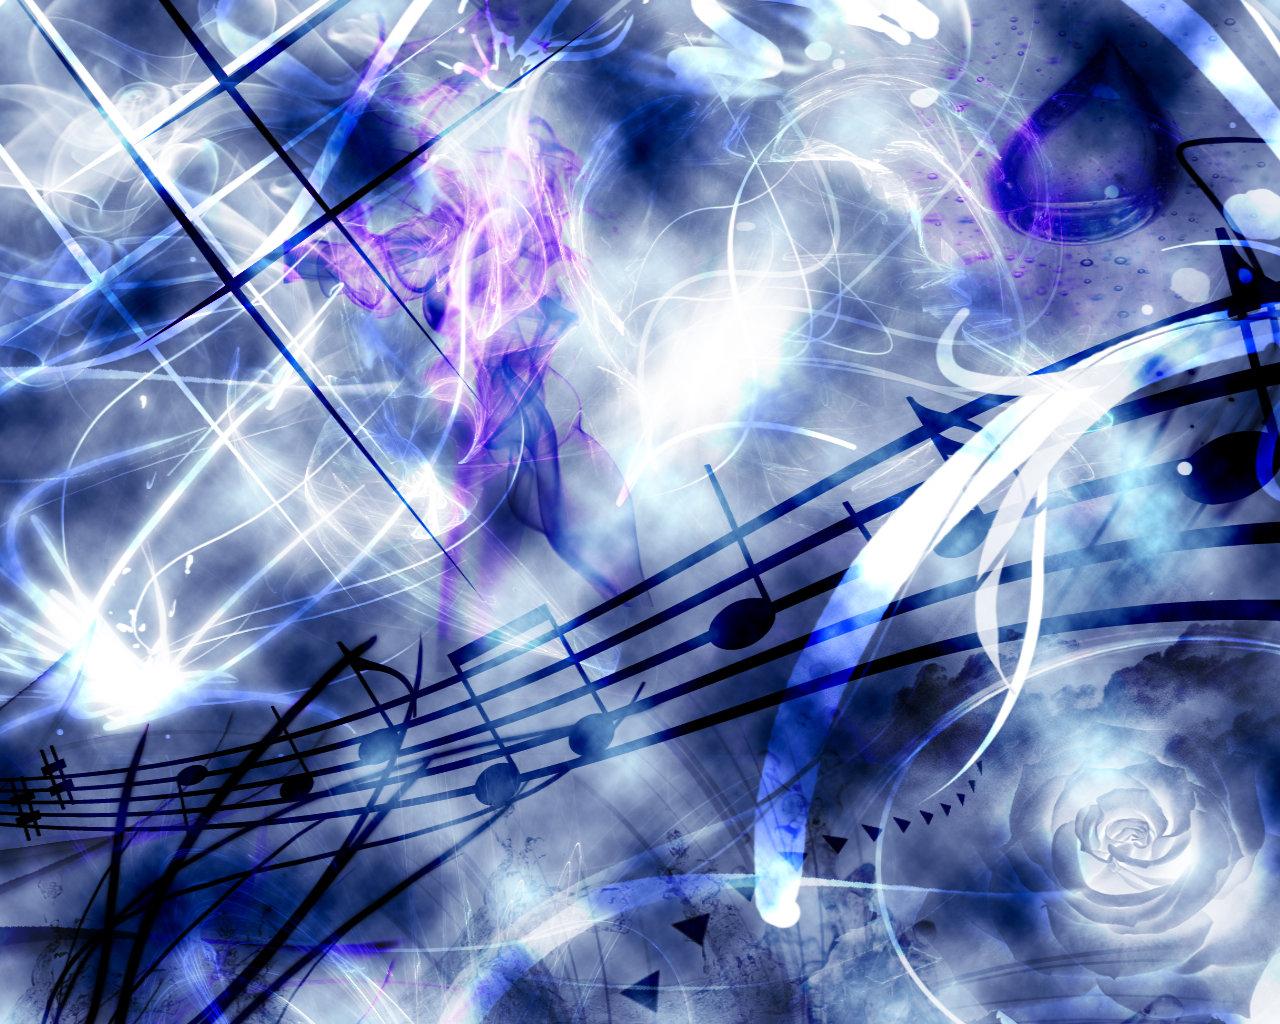 High Resolution Abstract Music Hd 1280x1024 Wallpaper ID209034 For Desktop